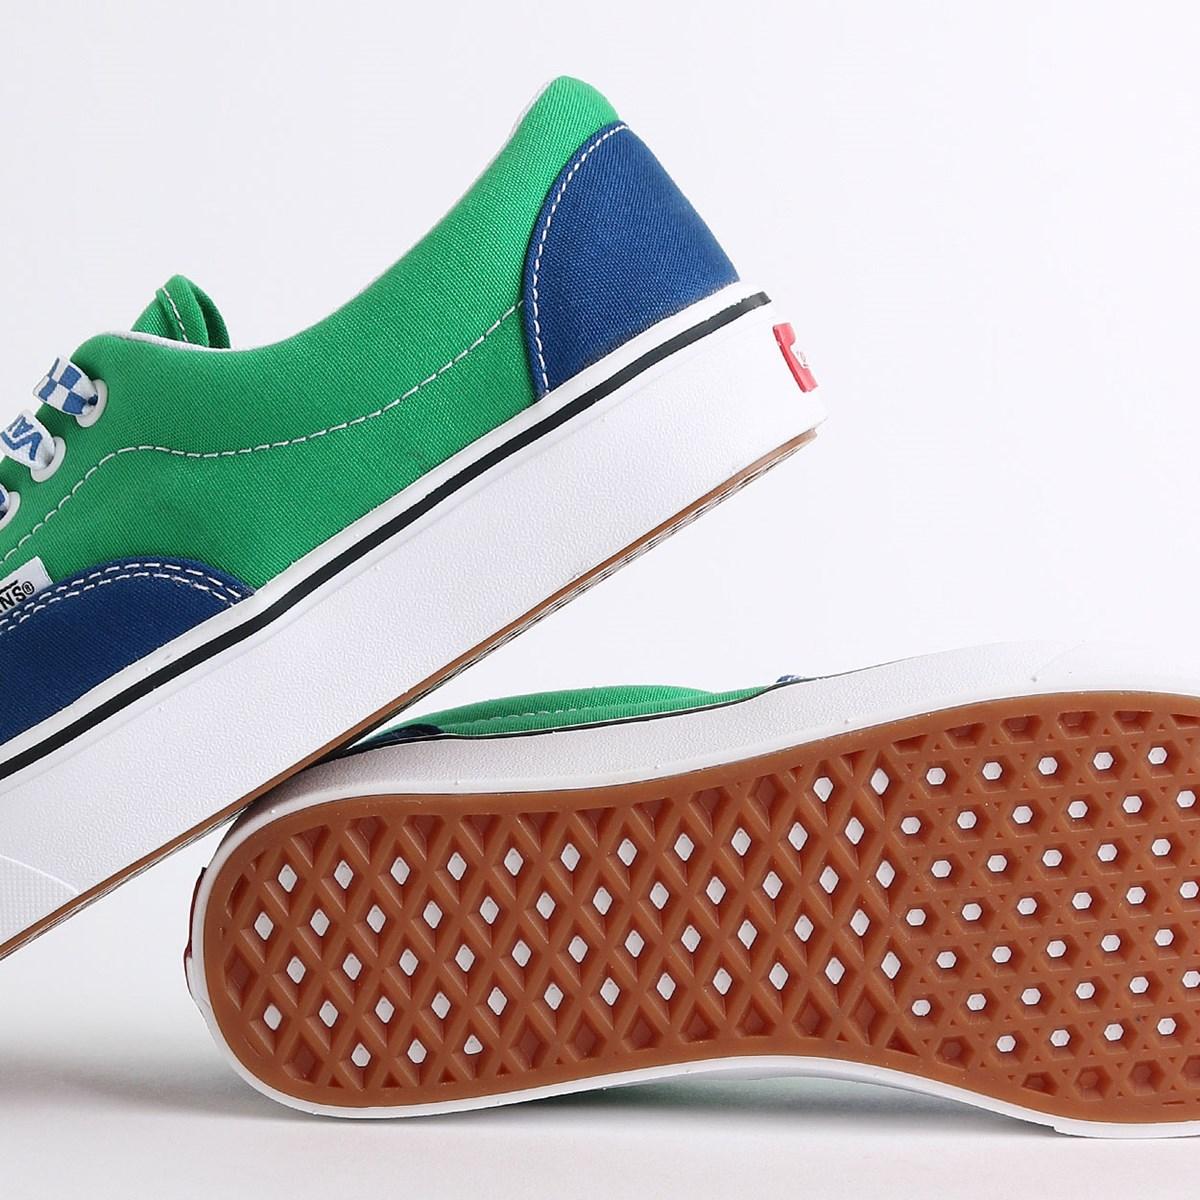 Tênis Vans ComfyCush Era Lace Mix True Blue Fern Green VN0A3WM9WI1